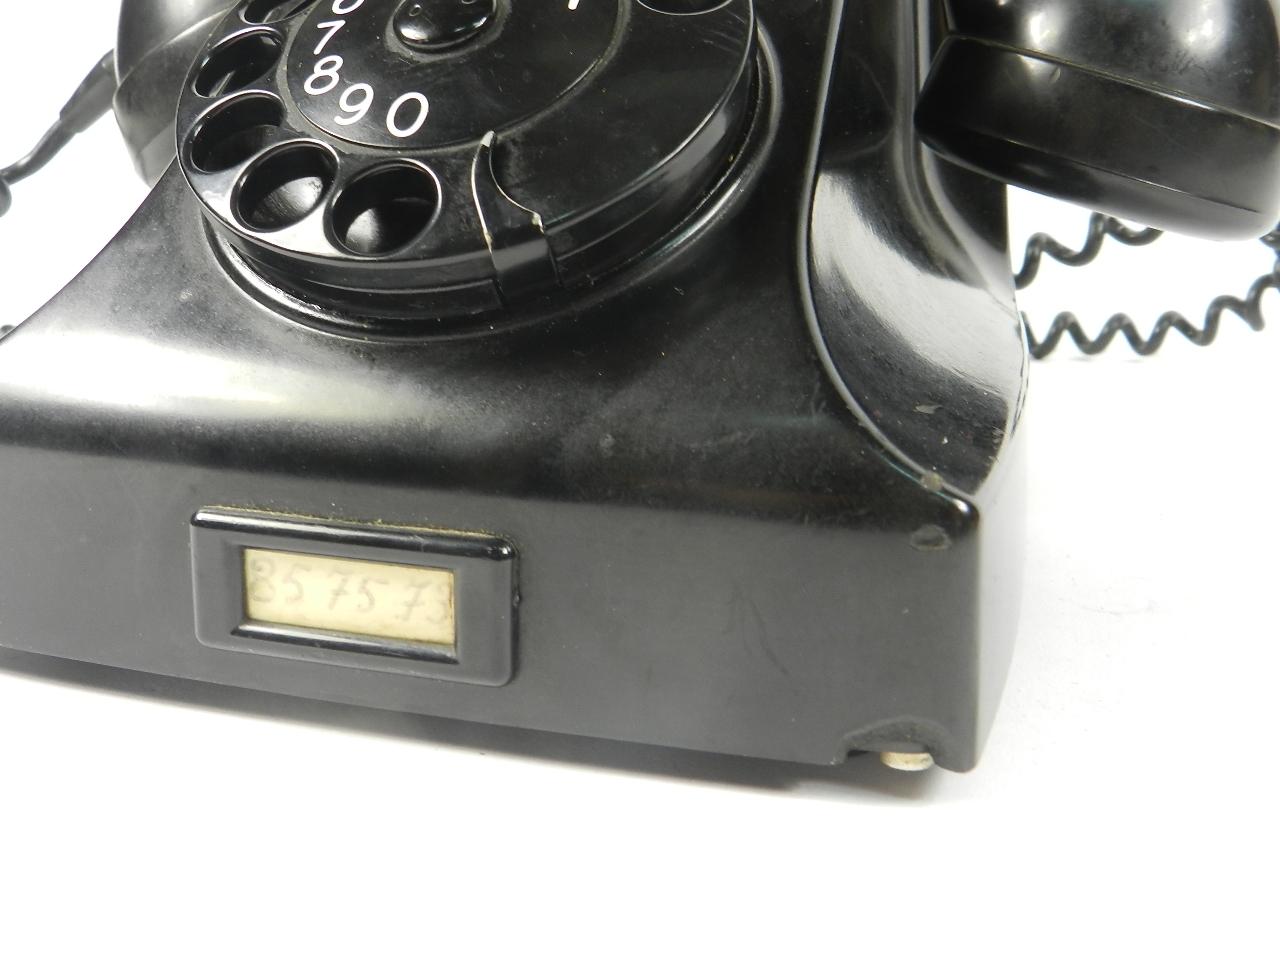 Imagen TELEFONO ERICSSON AÑO 1940 35360